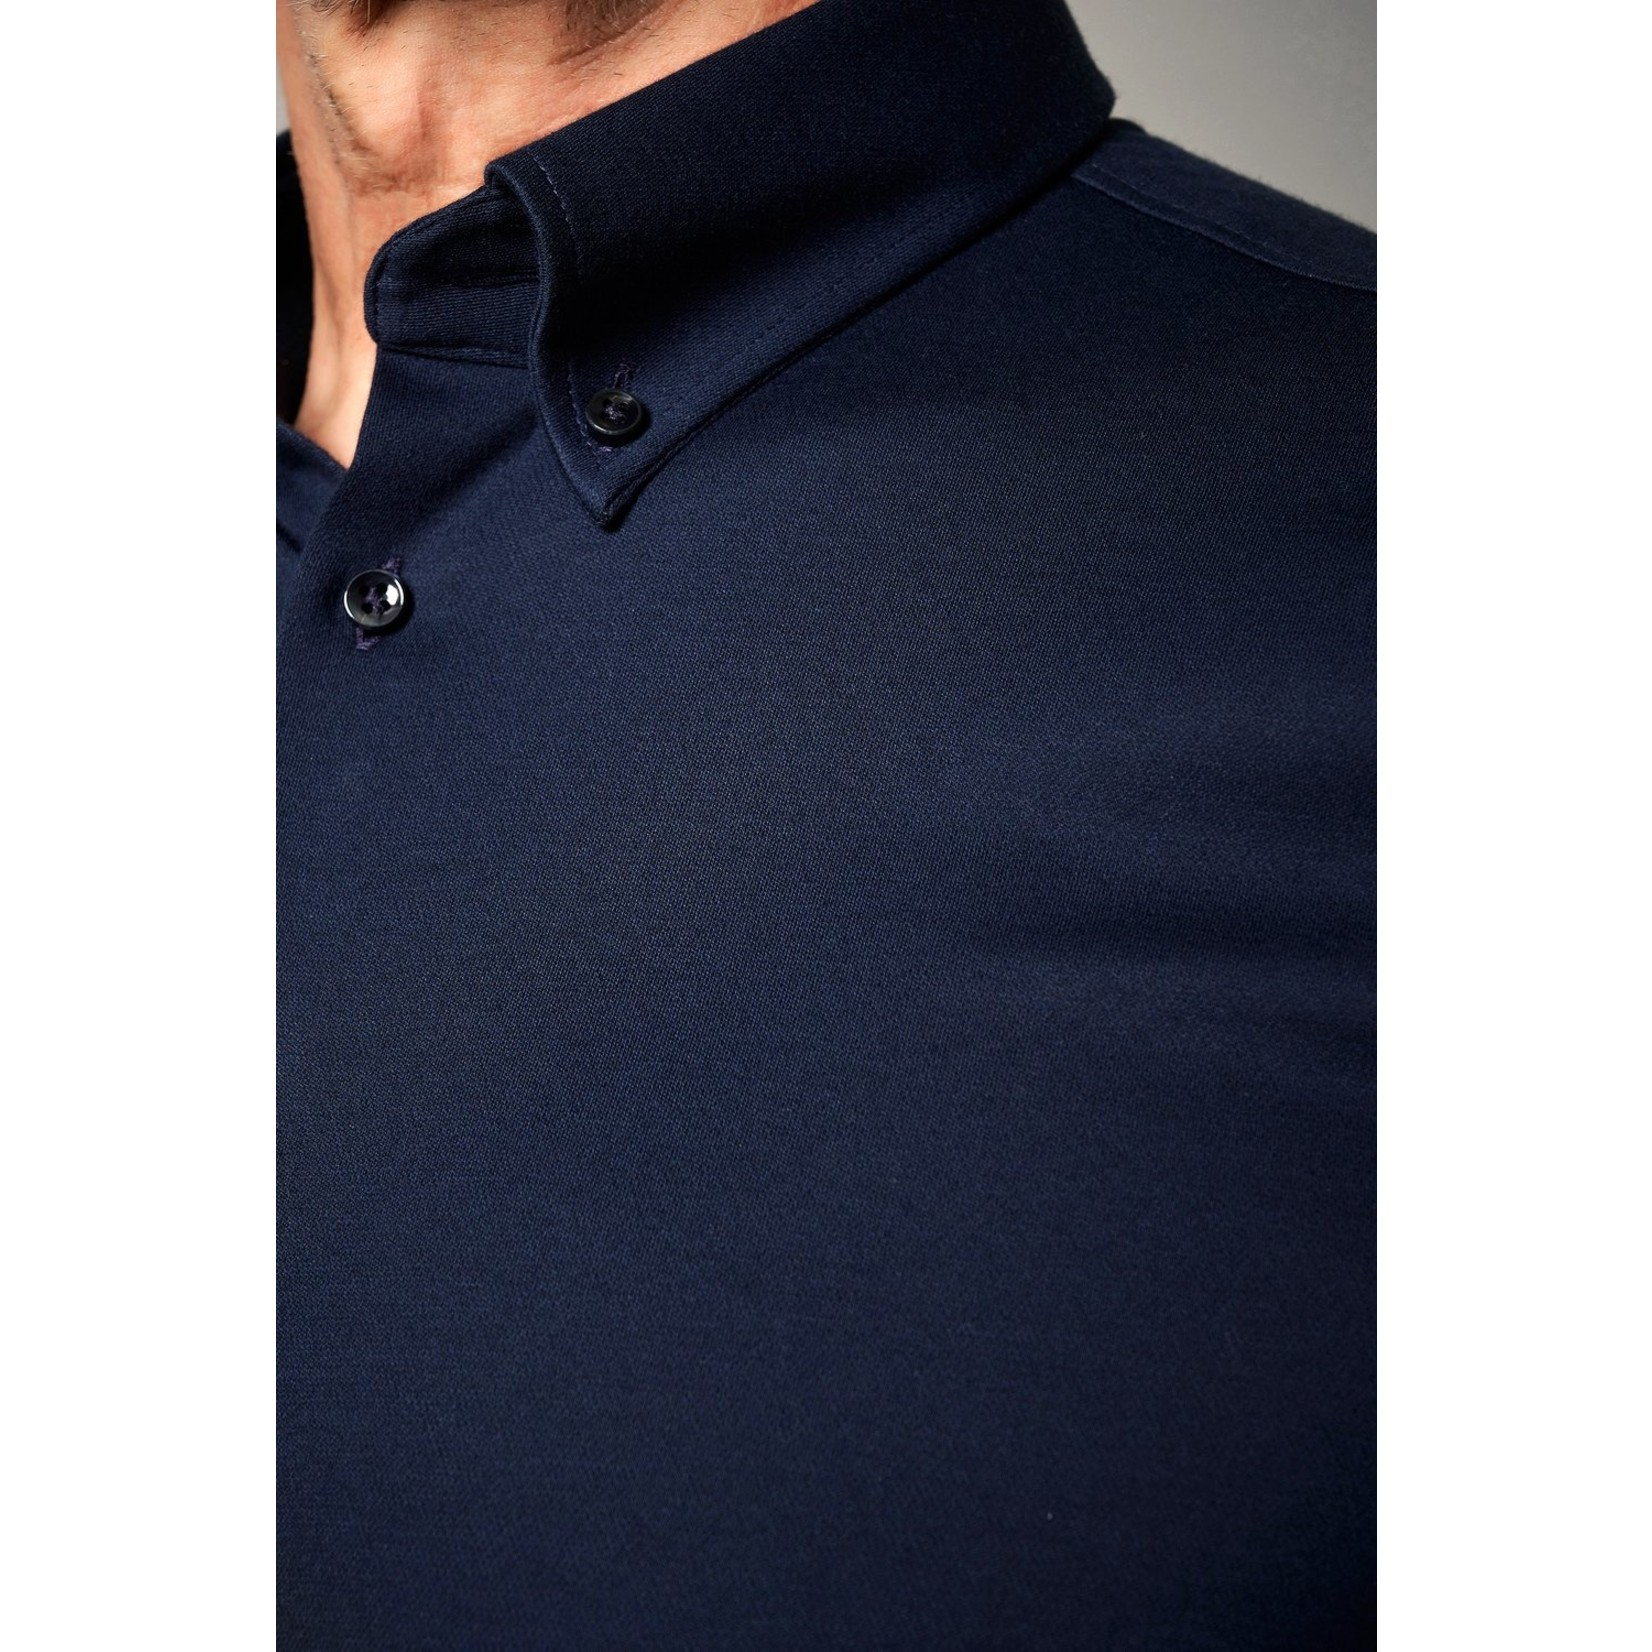 Desoto Luxury jersey overhemd marine